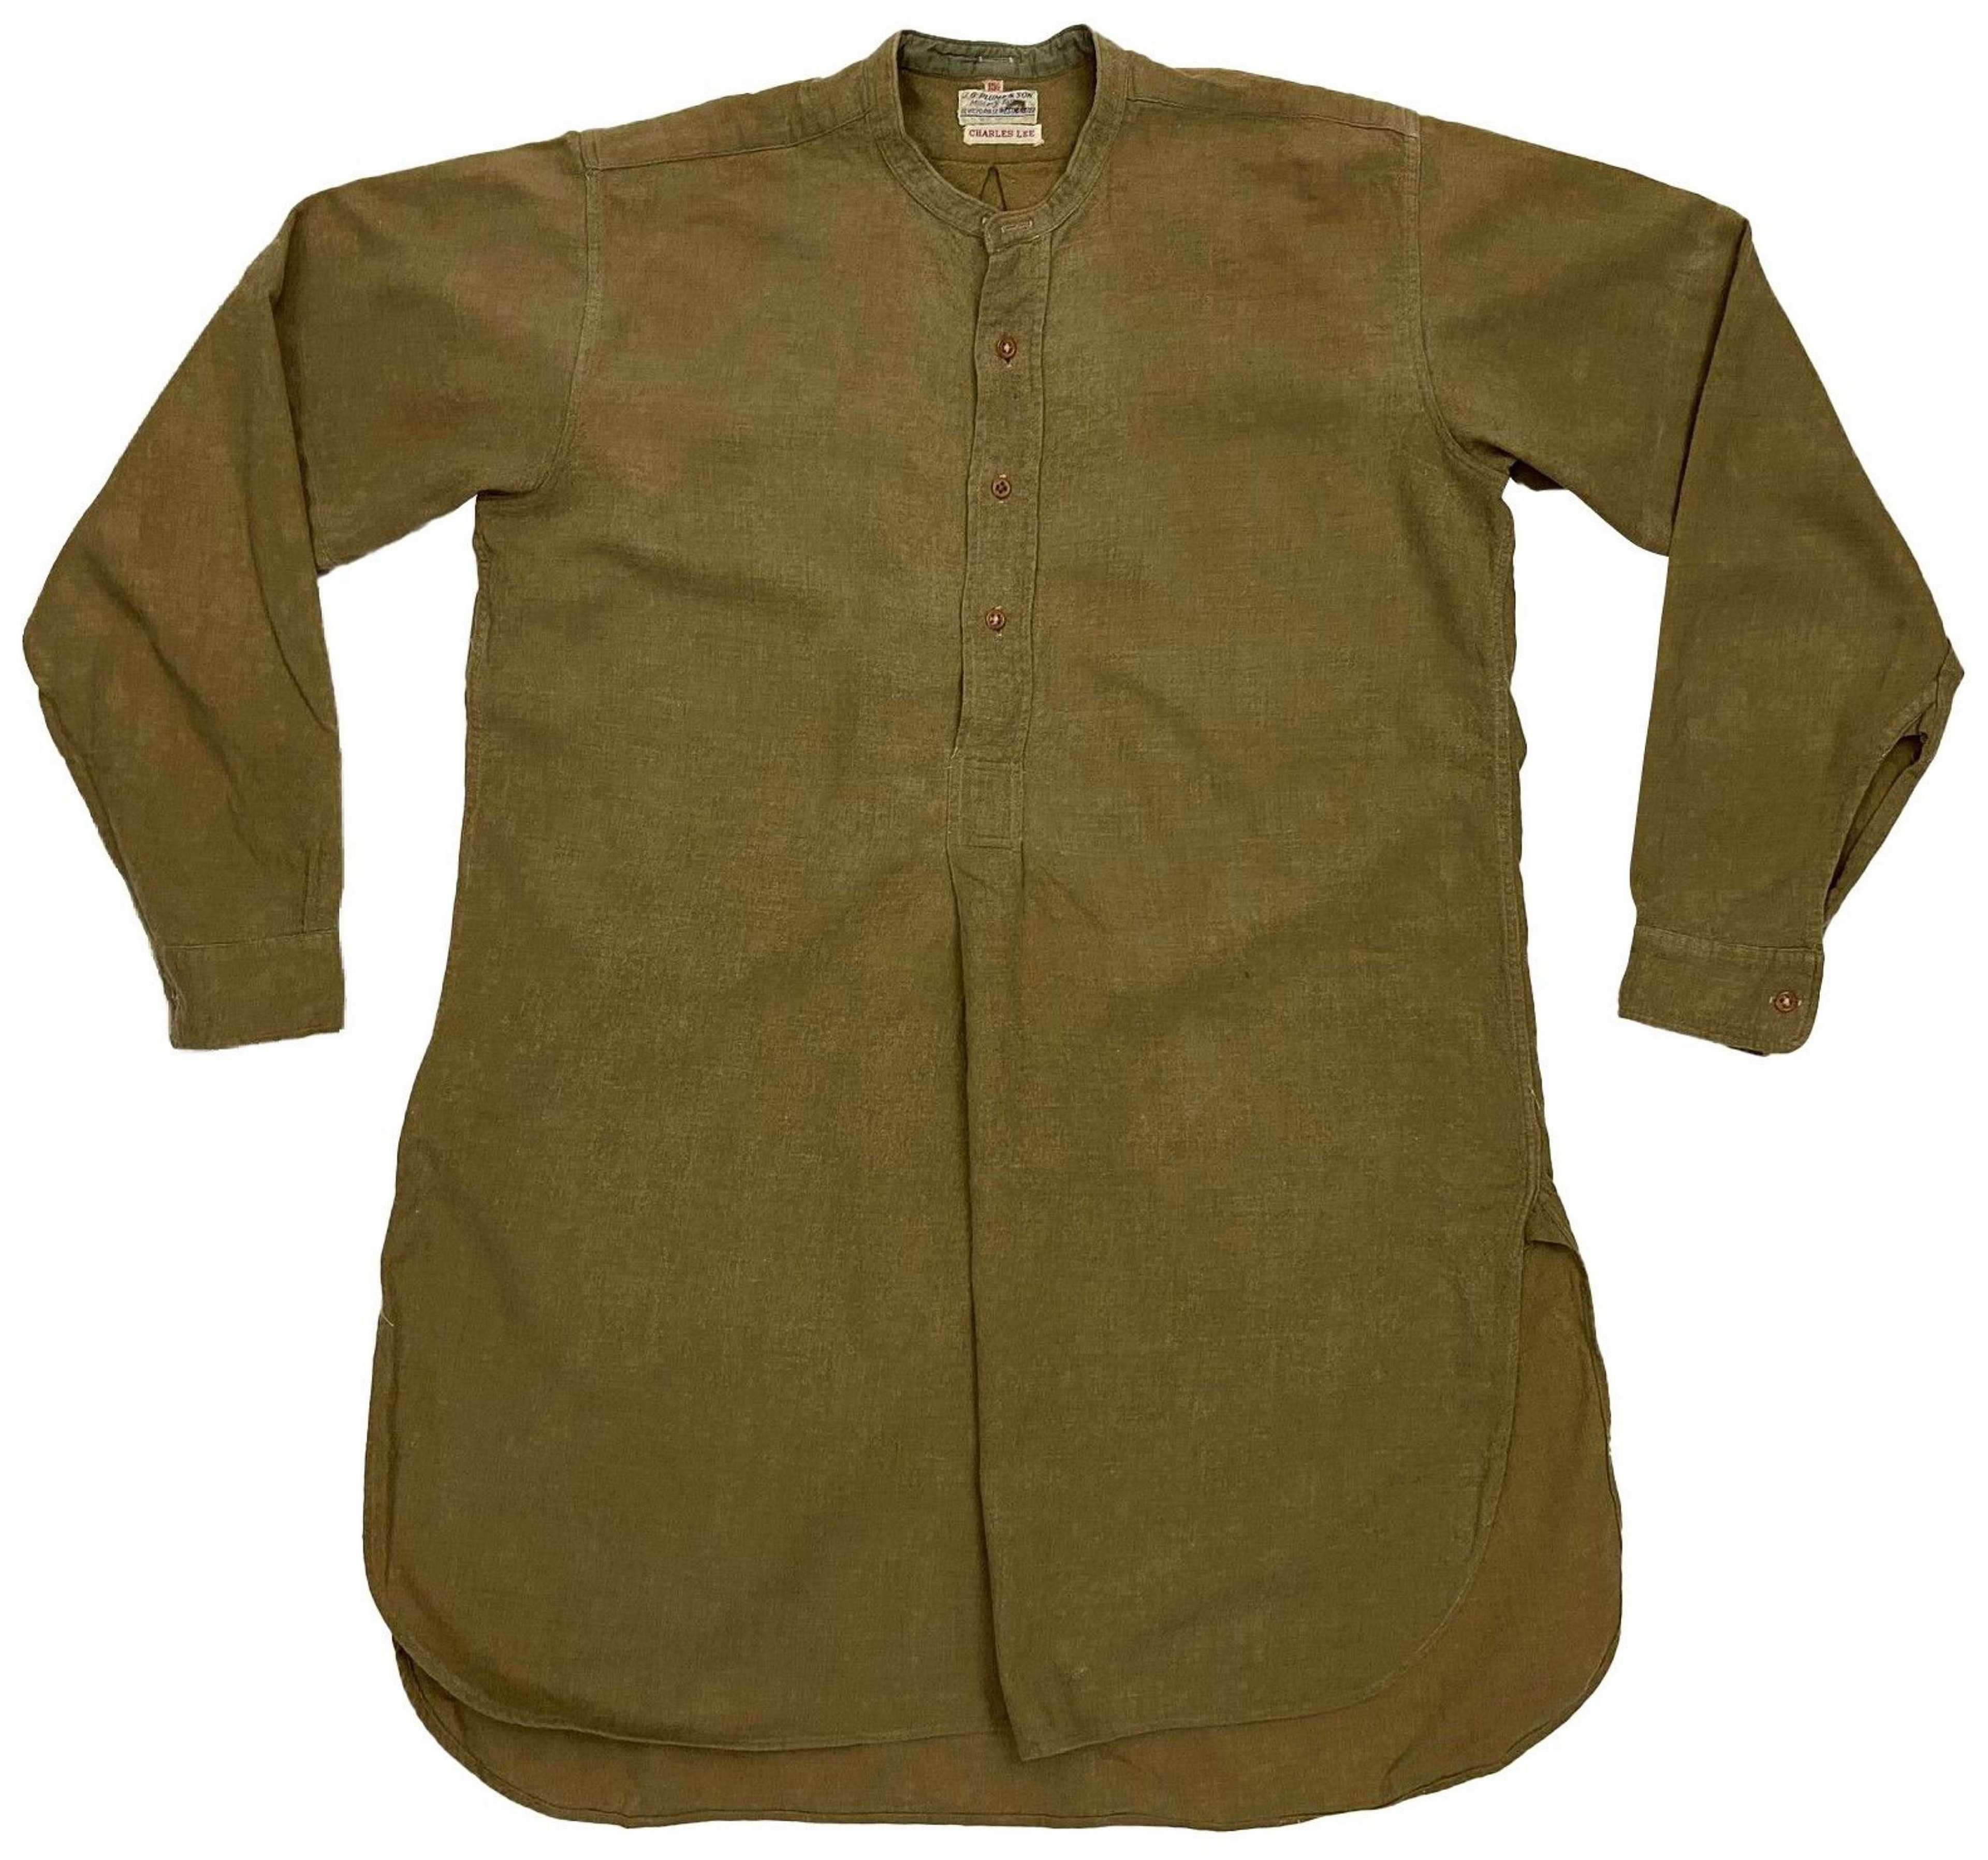 Original British Army Officers Collarless Shirt by 'J. G. Plumb'